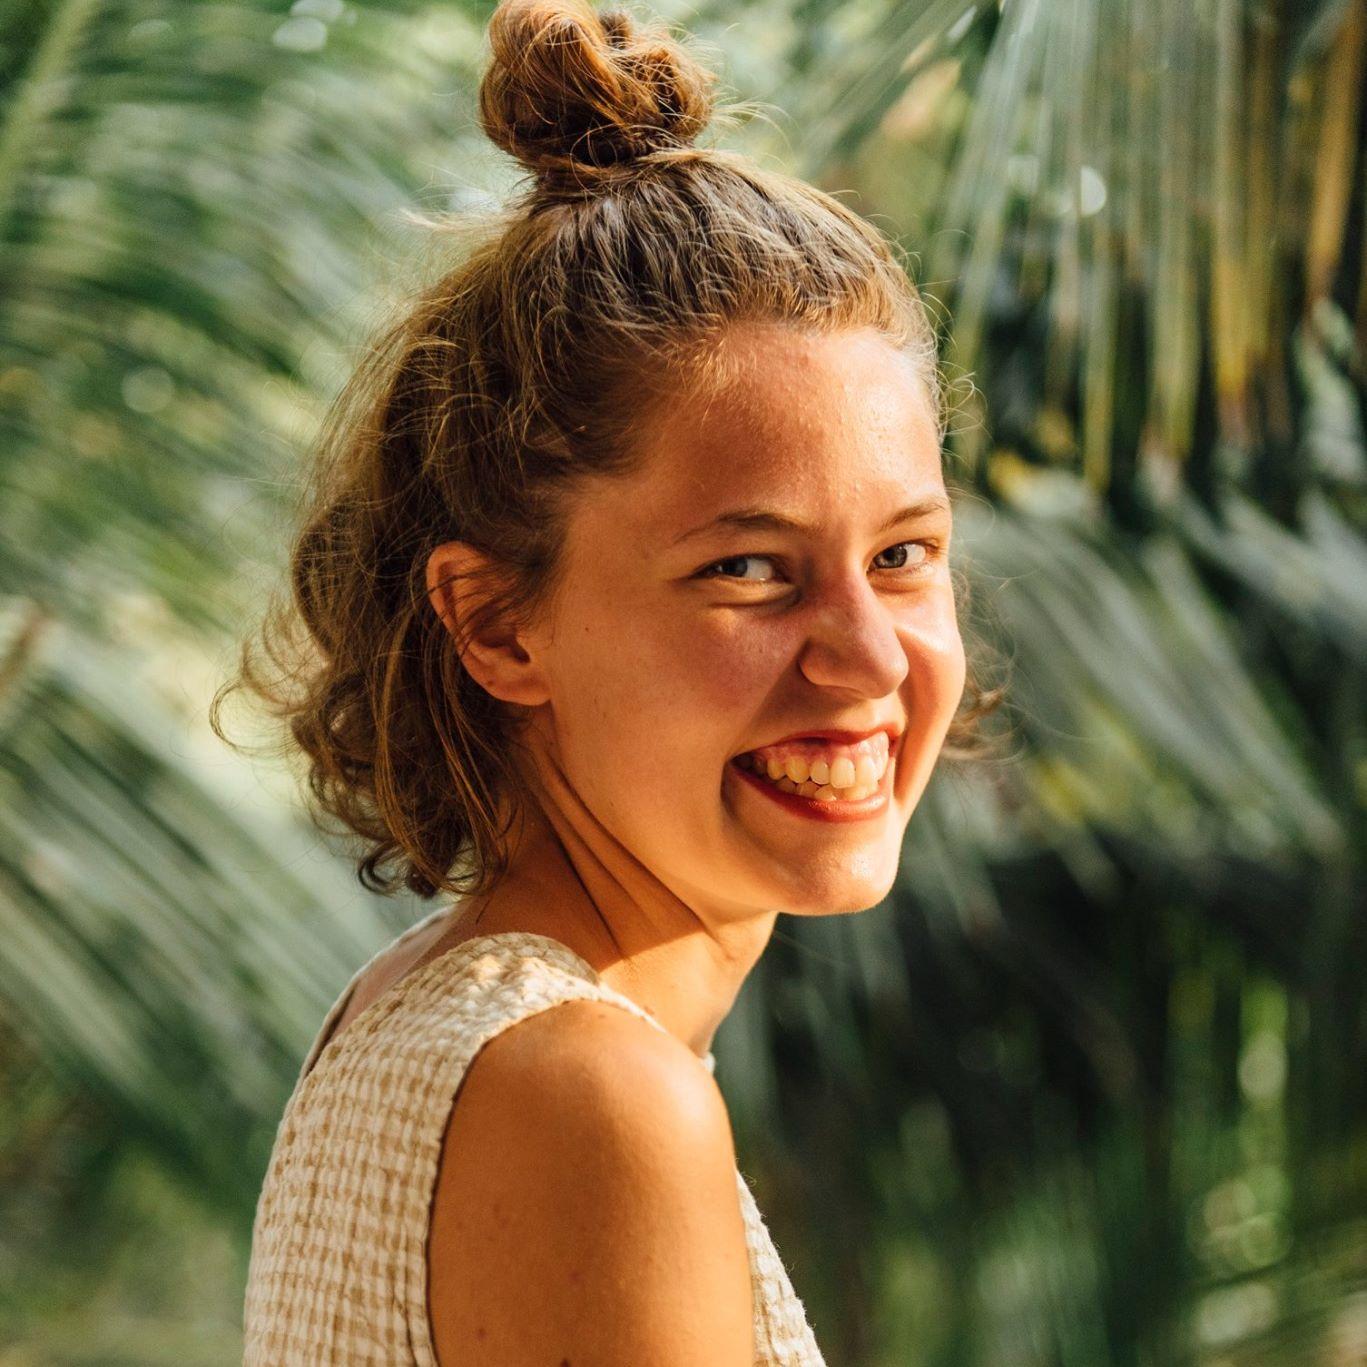 Anna-Laura Thomsen